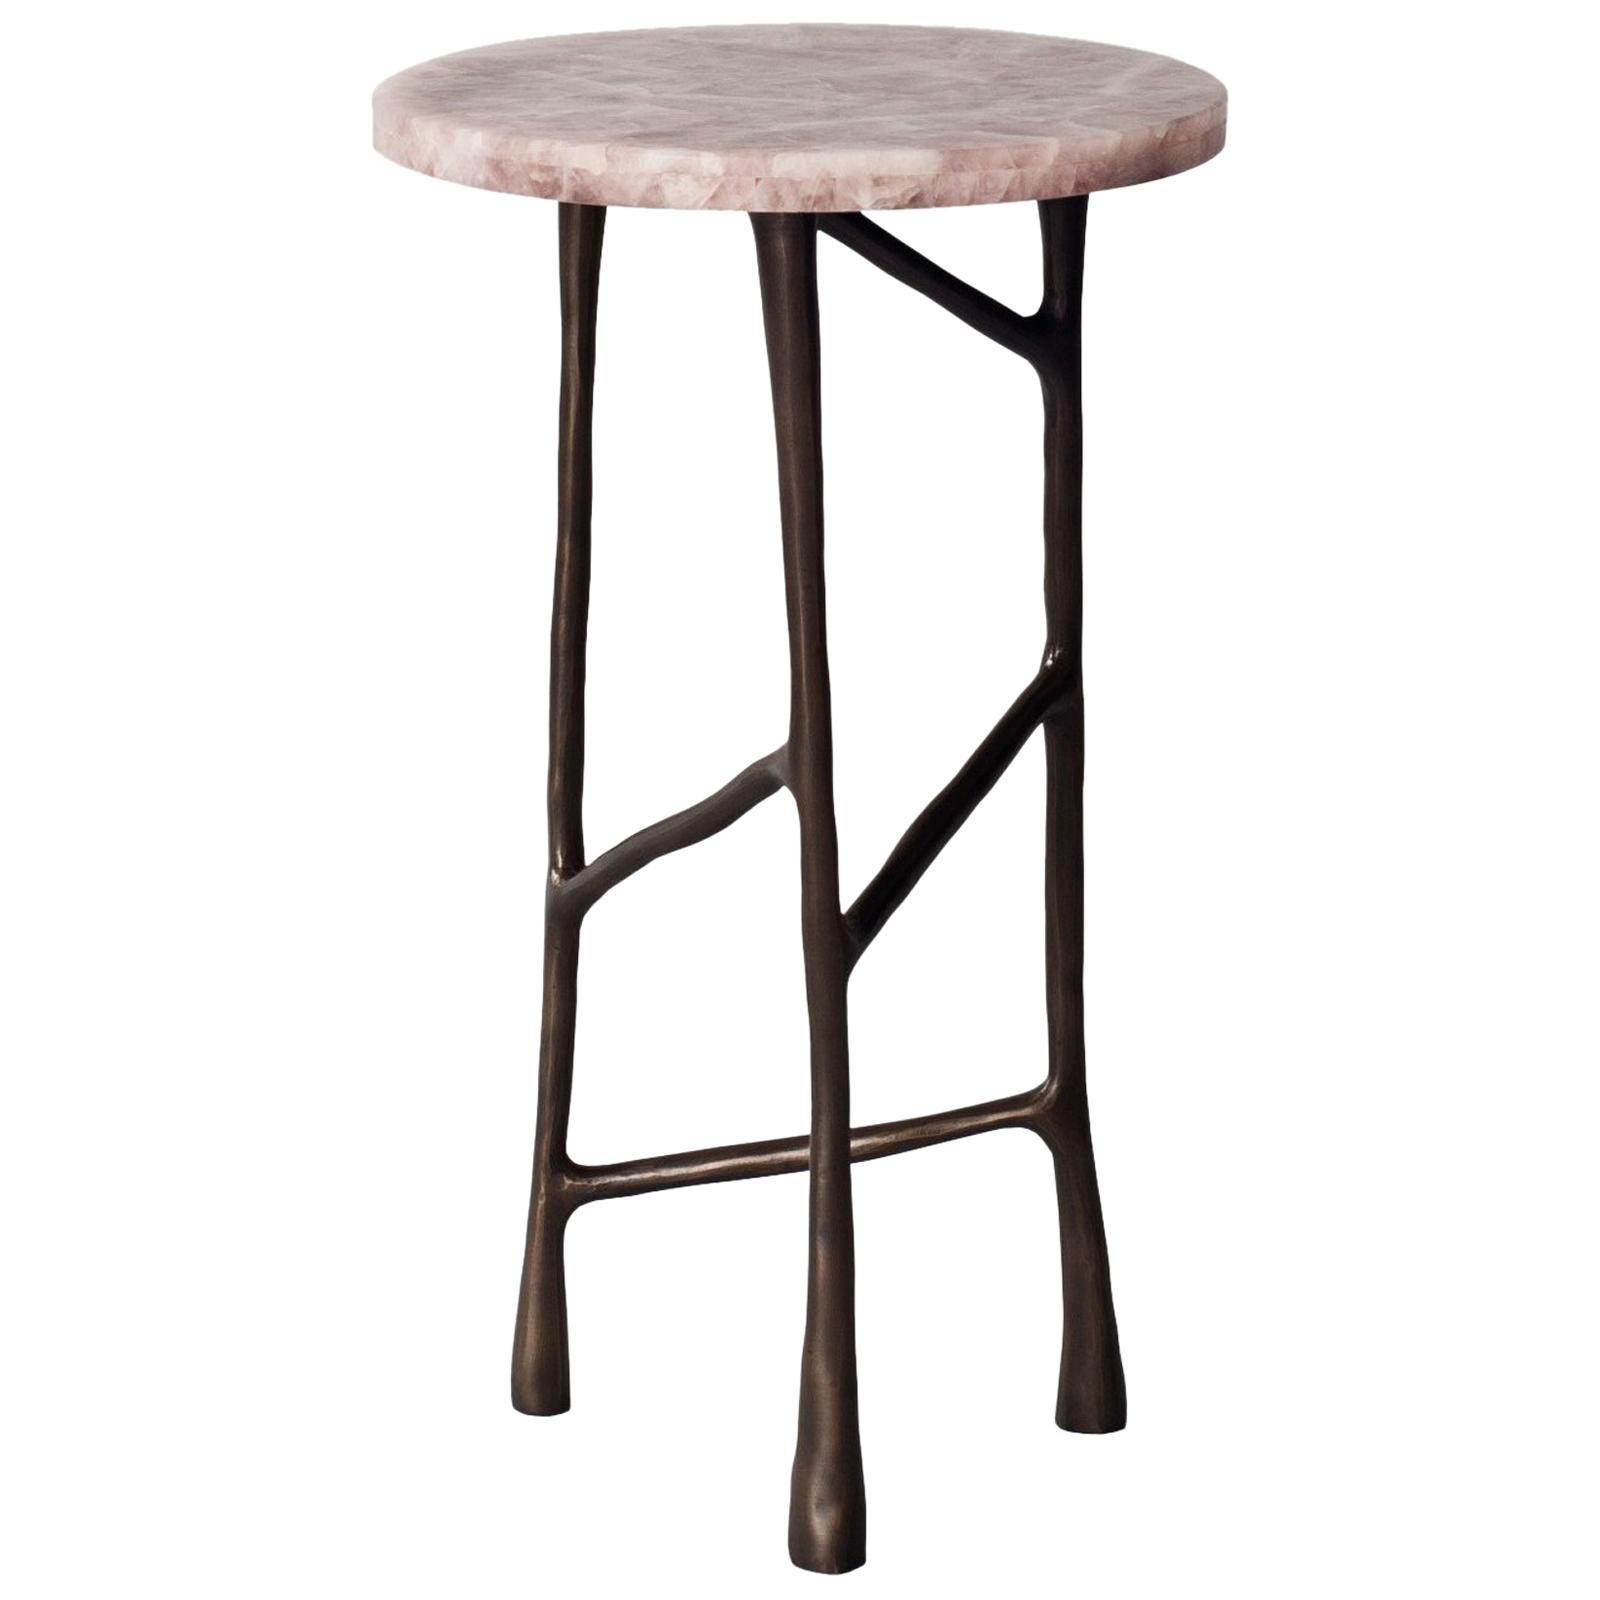 Forma Side Table by DeMuro Das in Pink Quartz